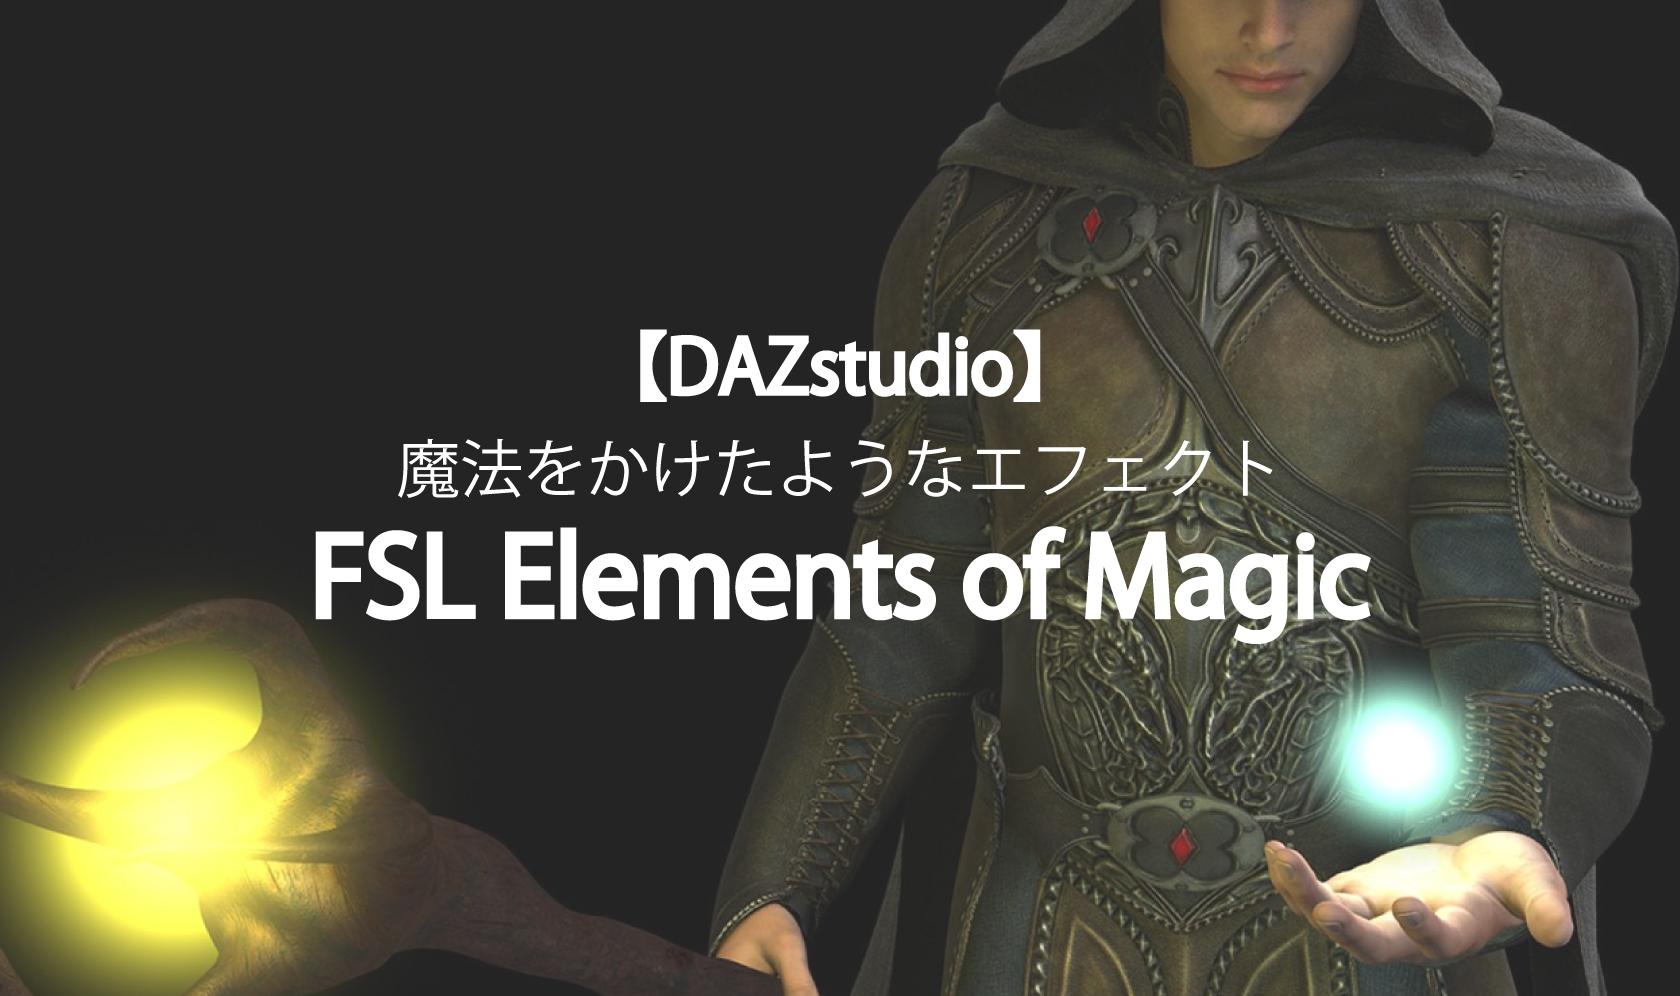 【DAZstudio】魔法をかけたようなエフェクト「FSL Elements of Magic」